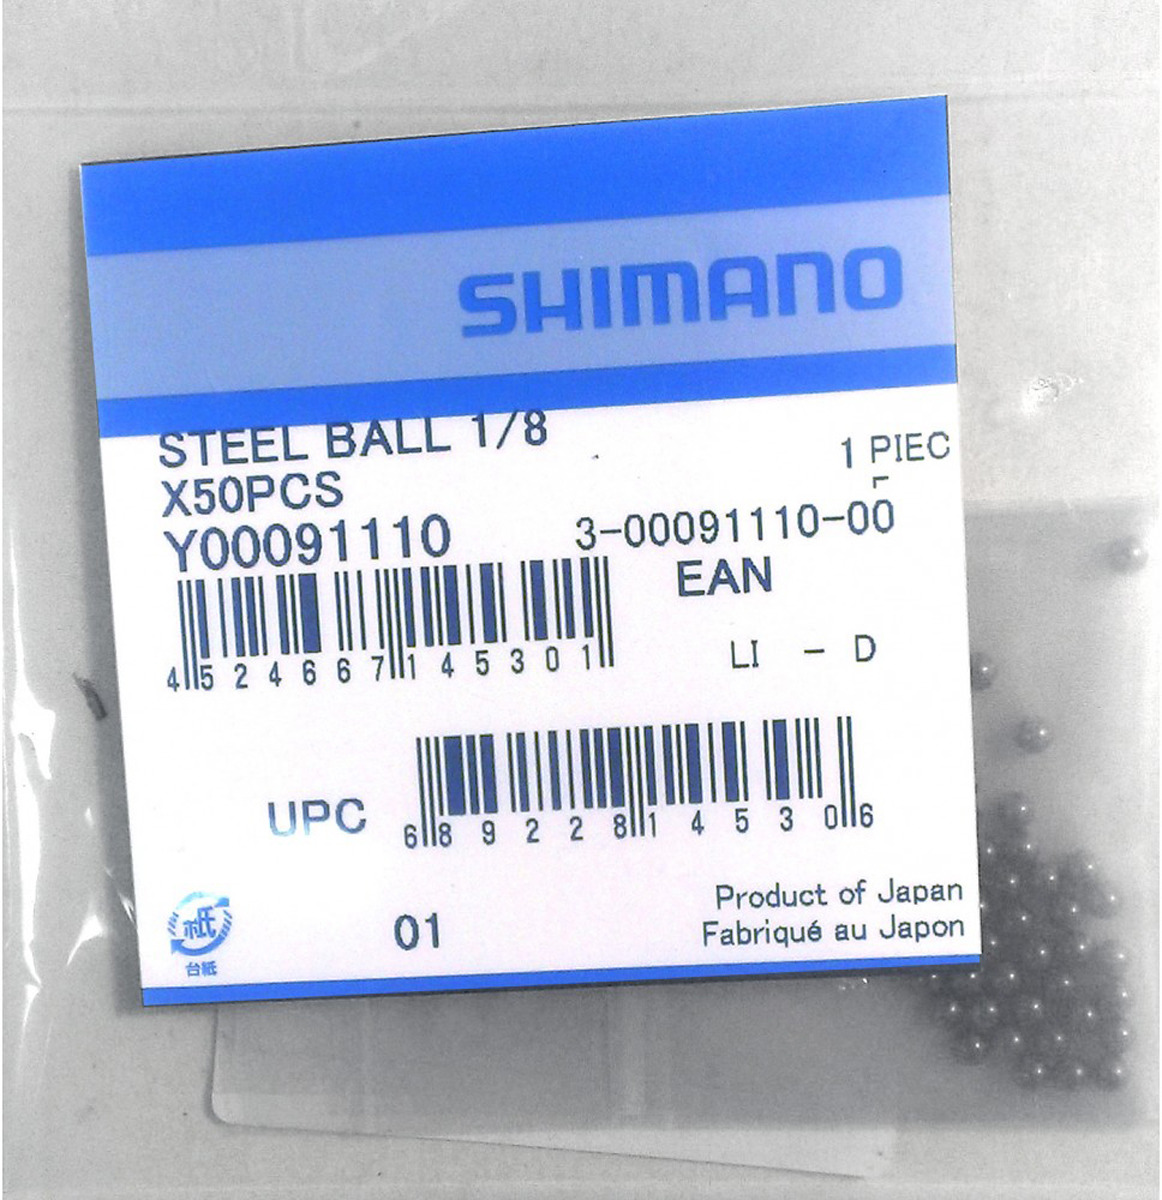 Шарик Shimano сталь 1/8, Y00091120, 50 шт